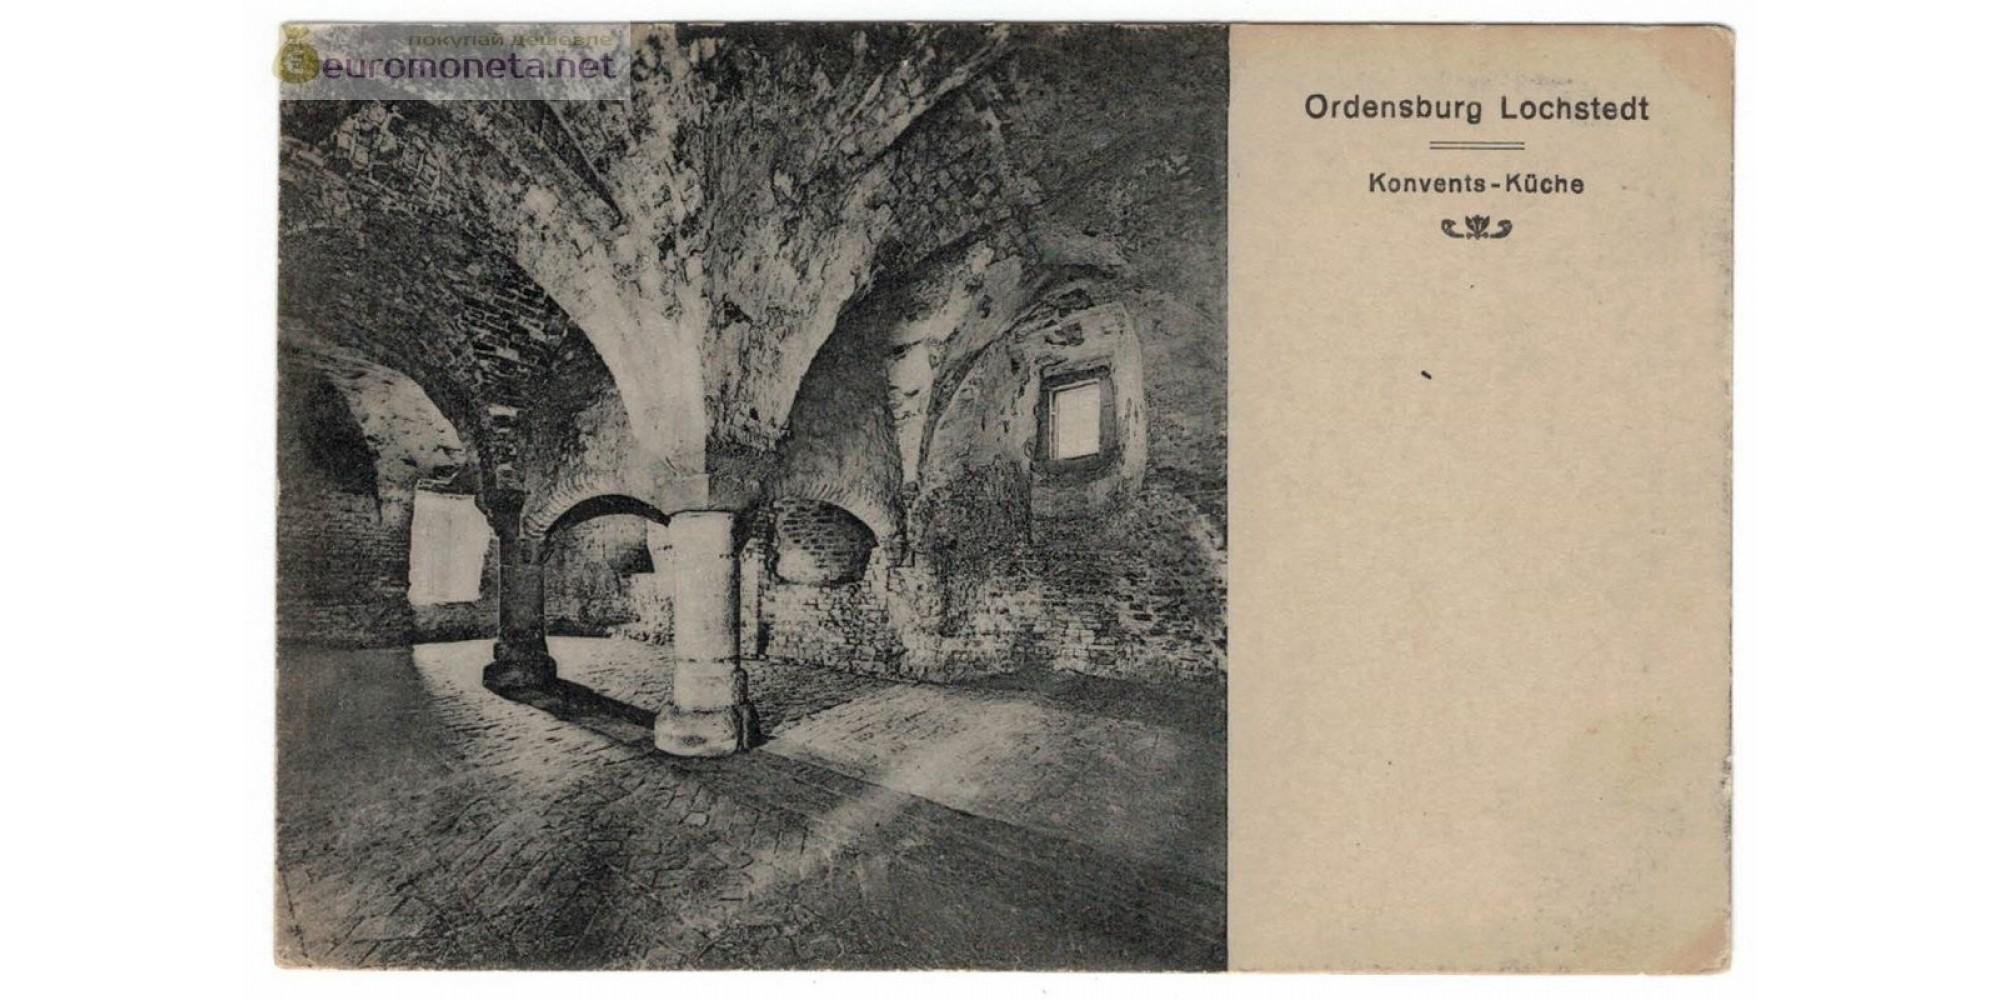 Открытка Пруссия Кёнигсберг Kenigsberg Калининград Королевский замок кухня